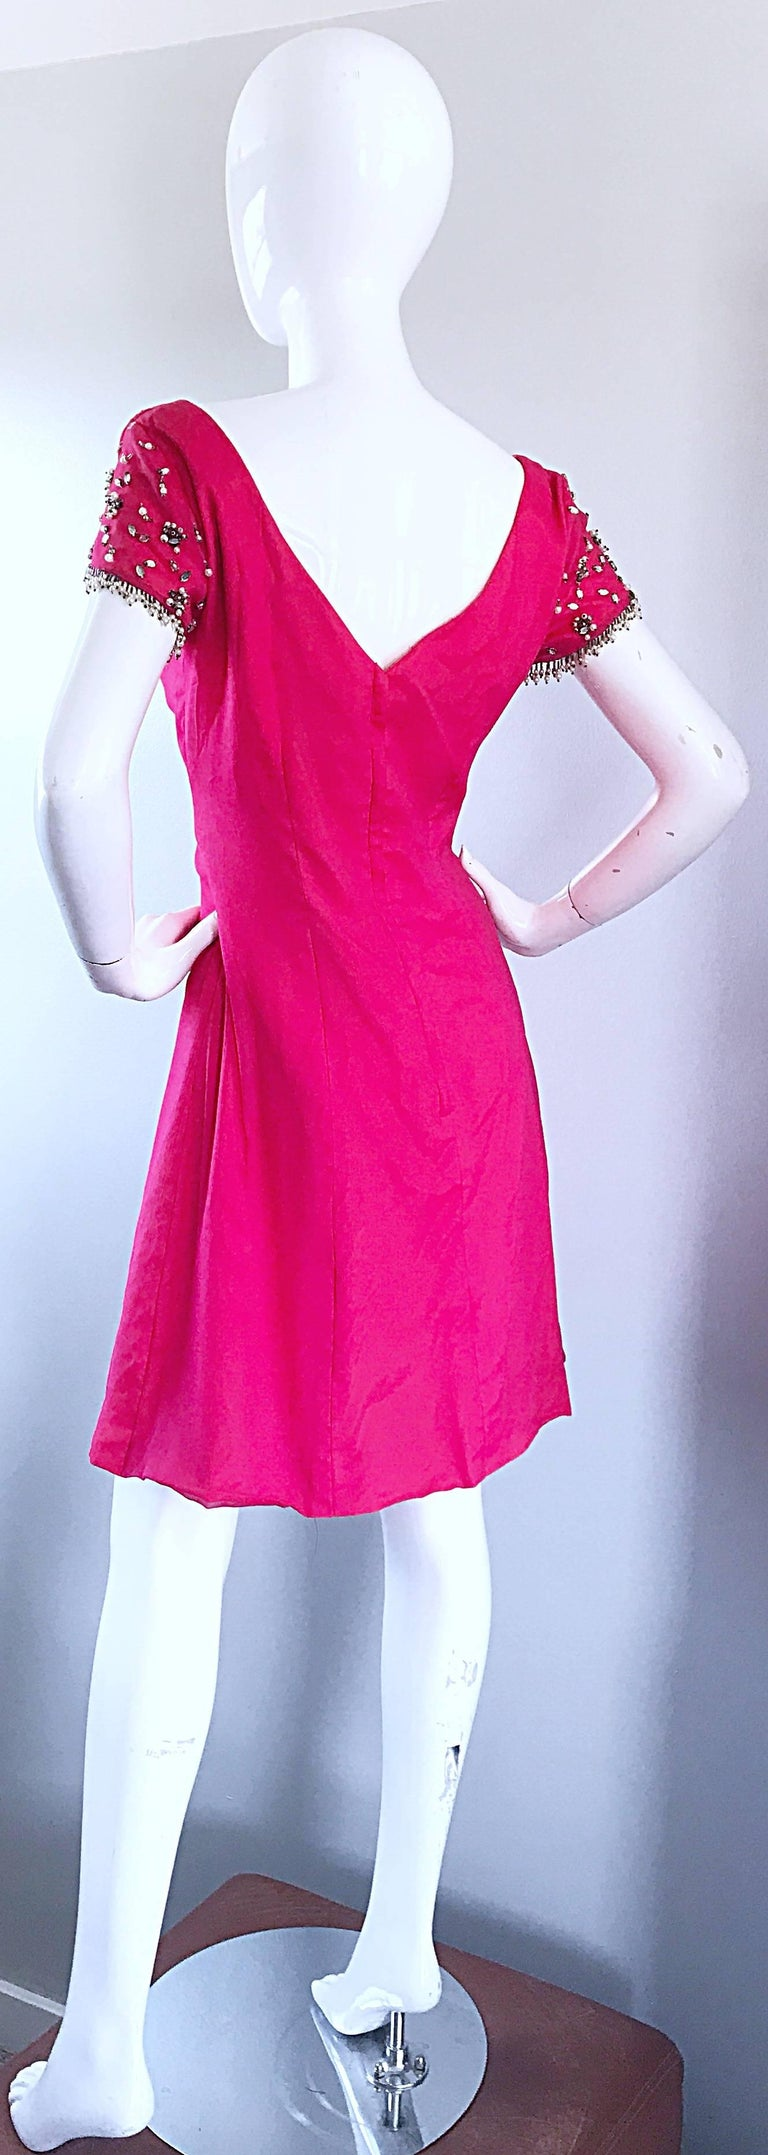 1960s Lilli Diamond Deadstock Hot Pink Fuchsia Vintage 60s A Line Chiffon Dress In New Condition For Sale In Chicago, IL